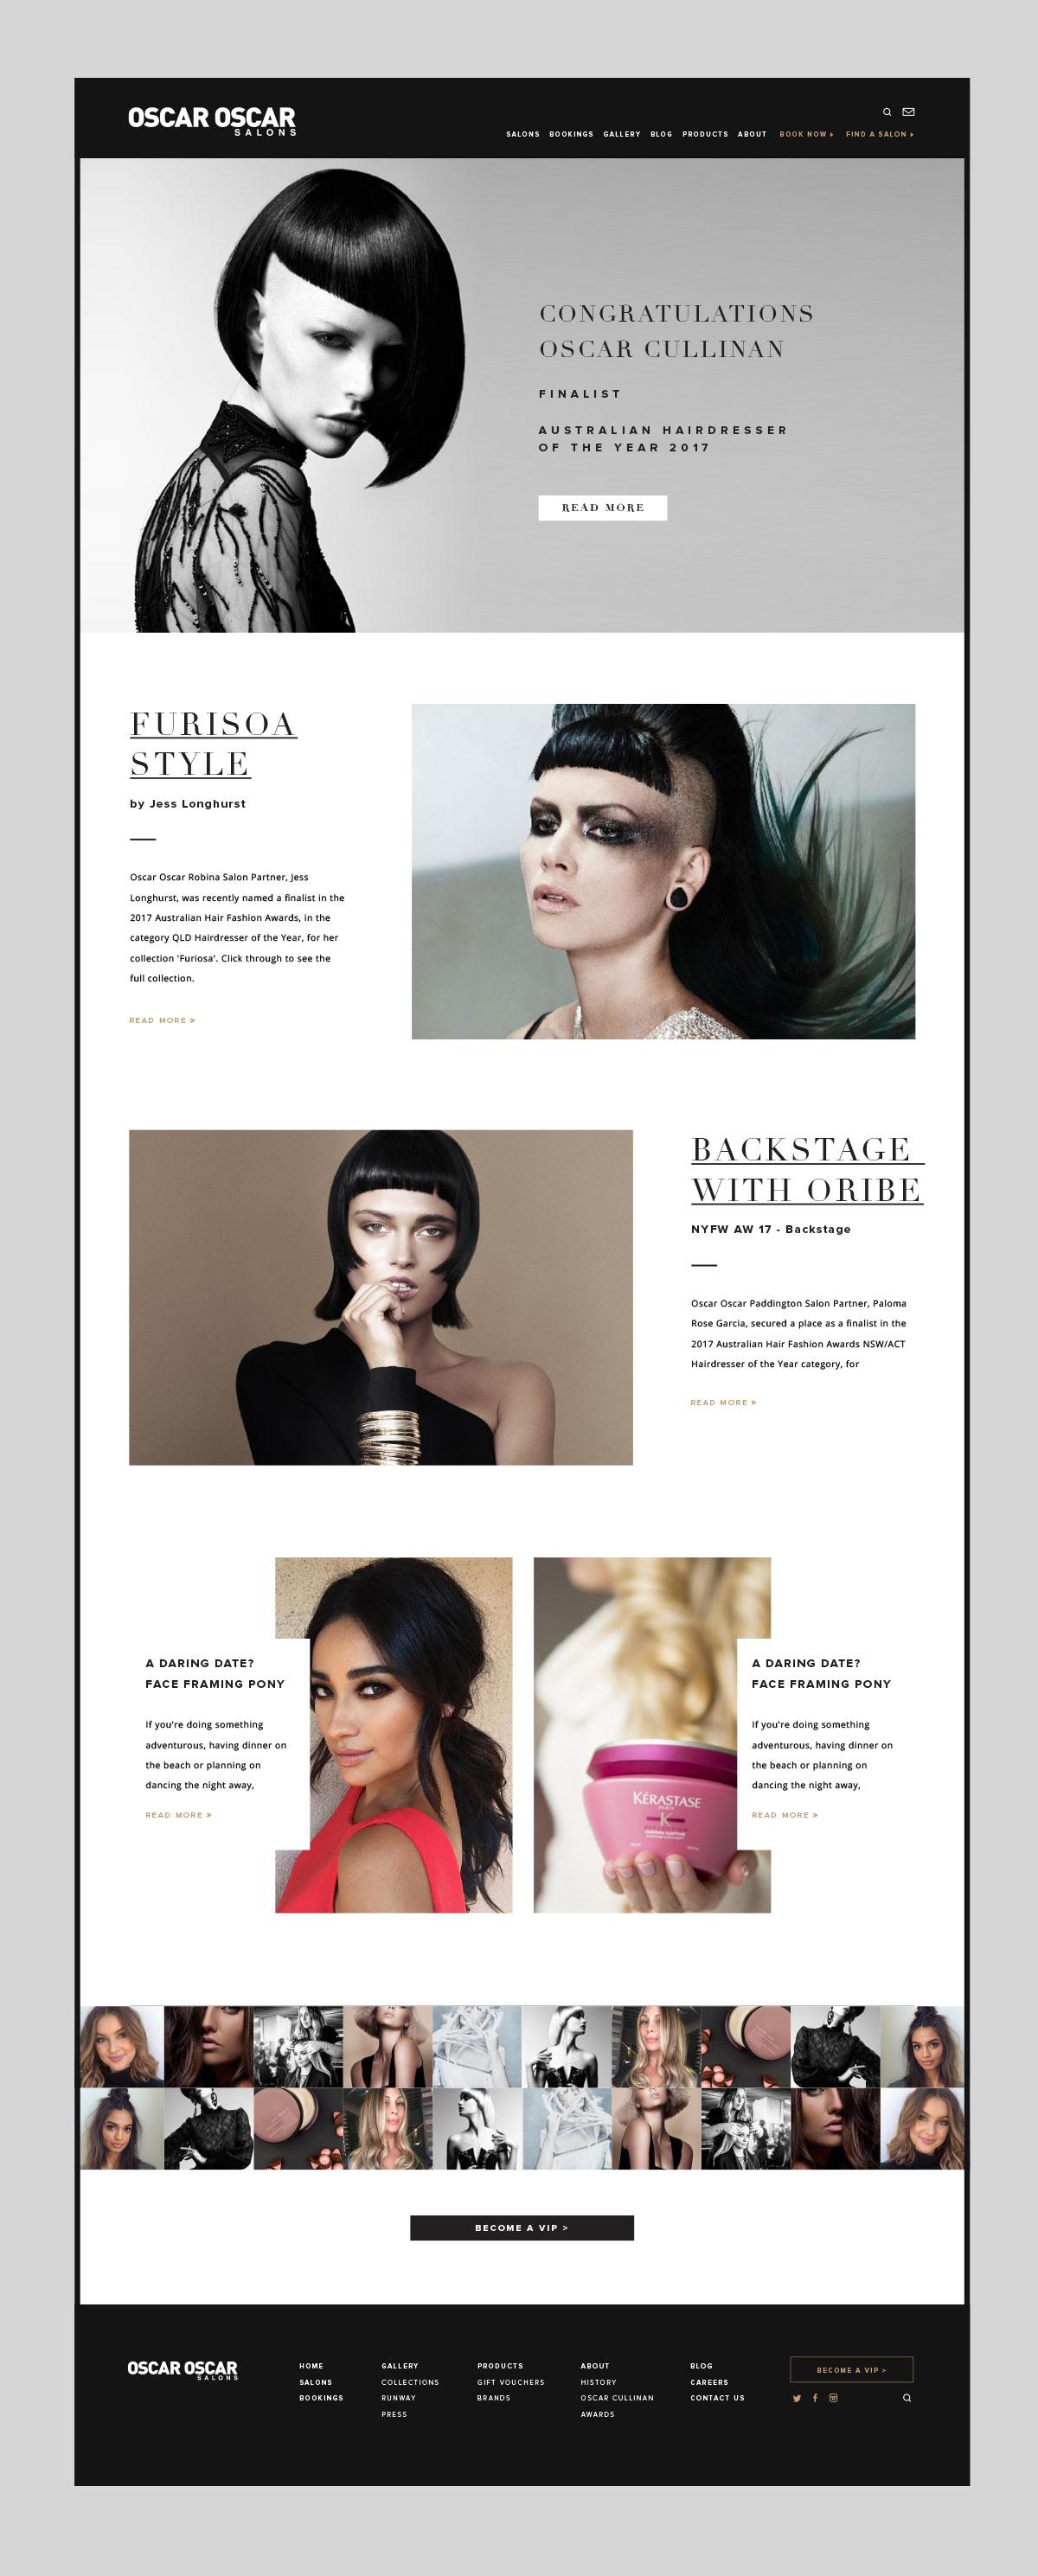 Oscar Oscar Salons Graphic Design - Responsive view of website